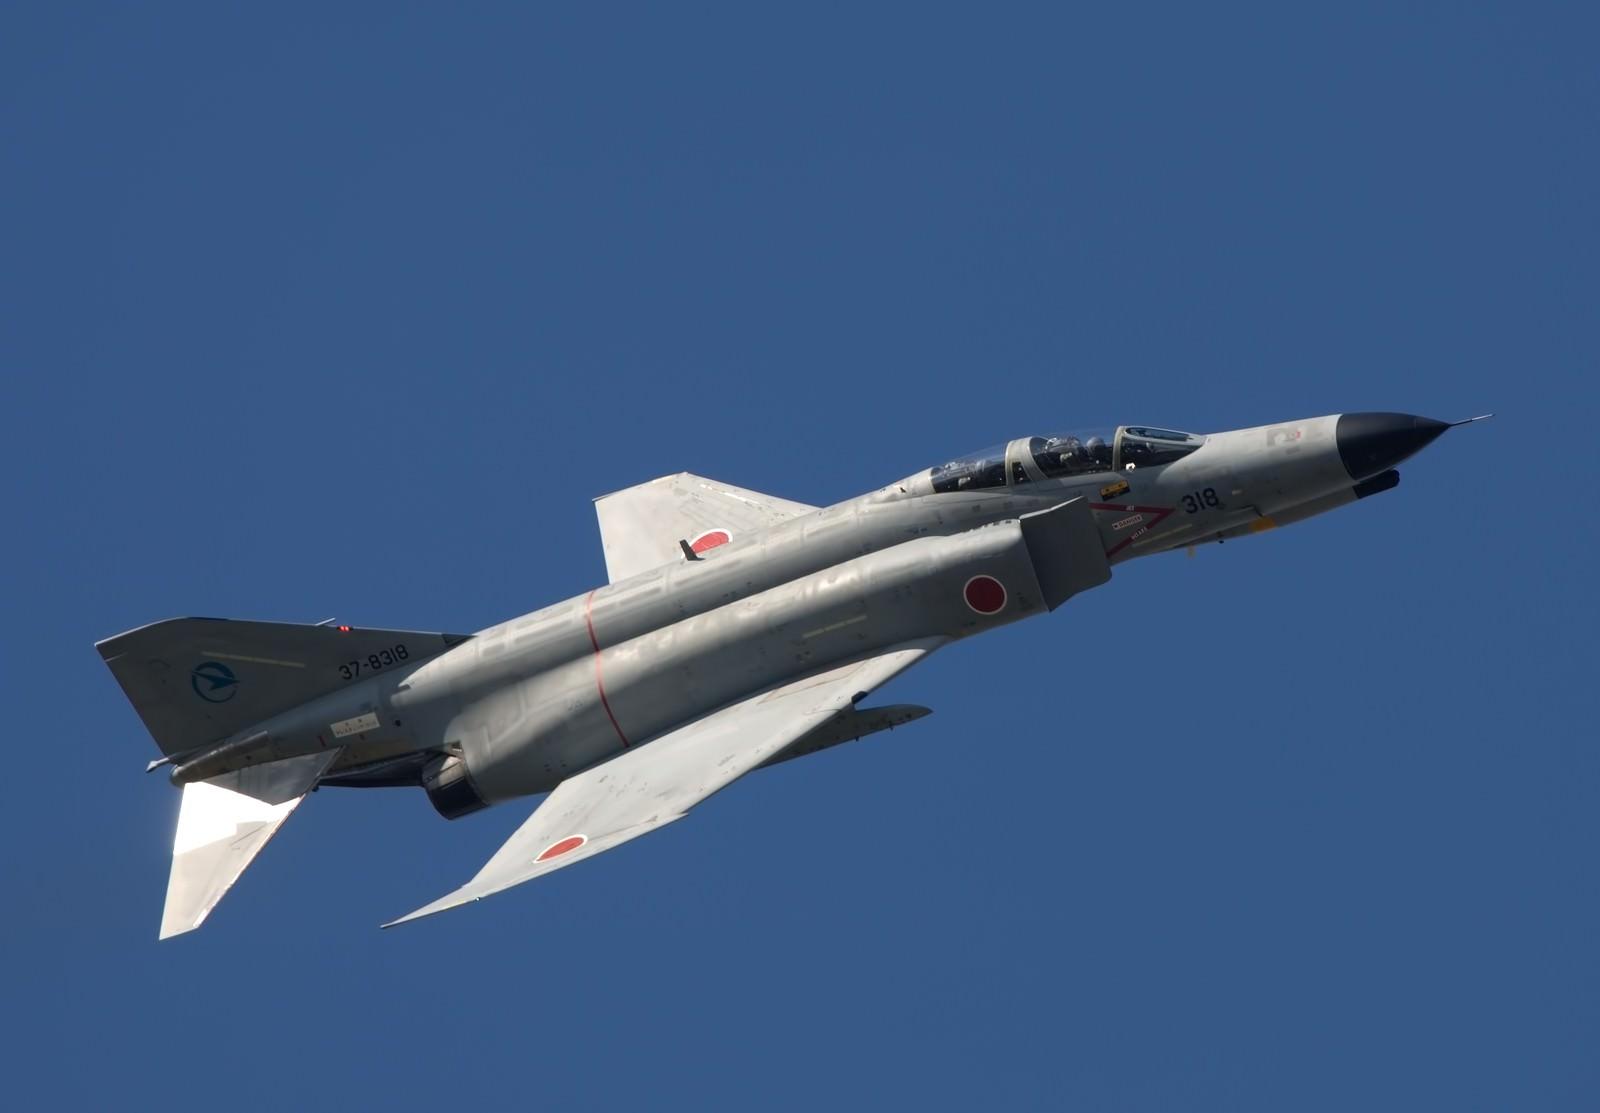 F 4 (戦闘機)の画像 p1_38